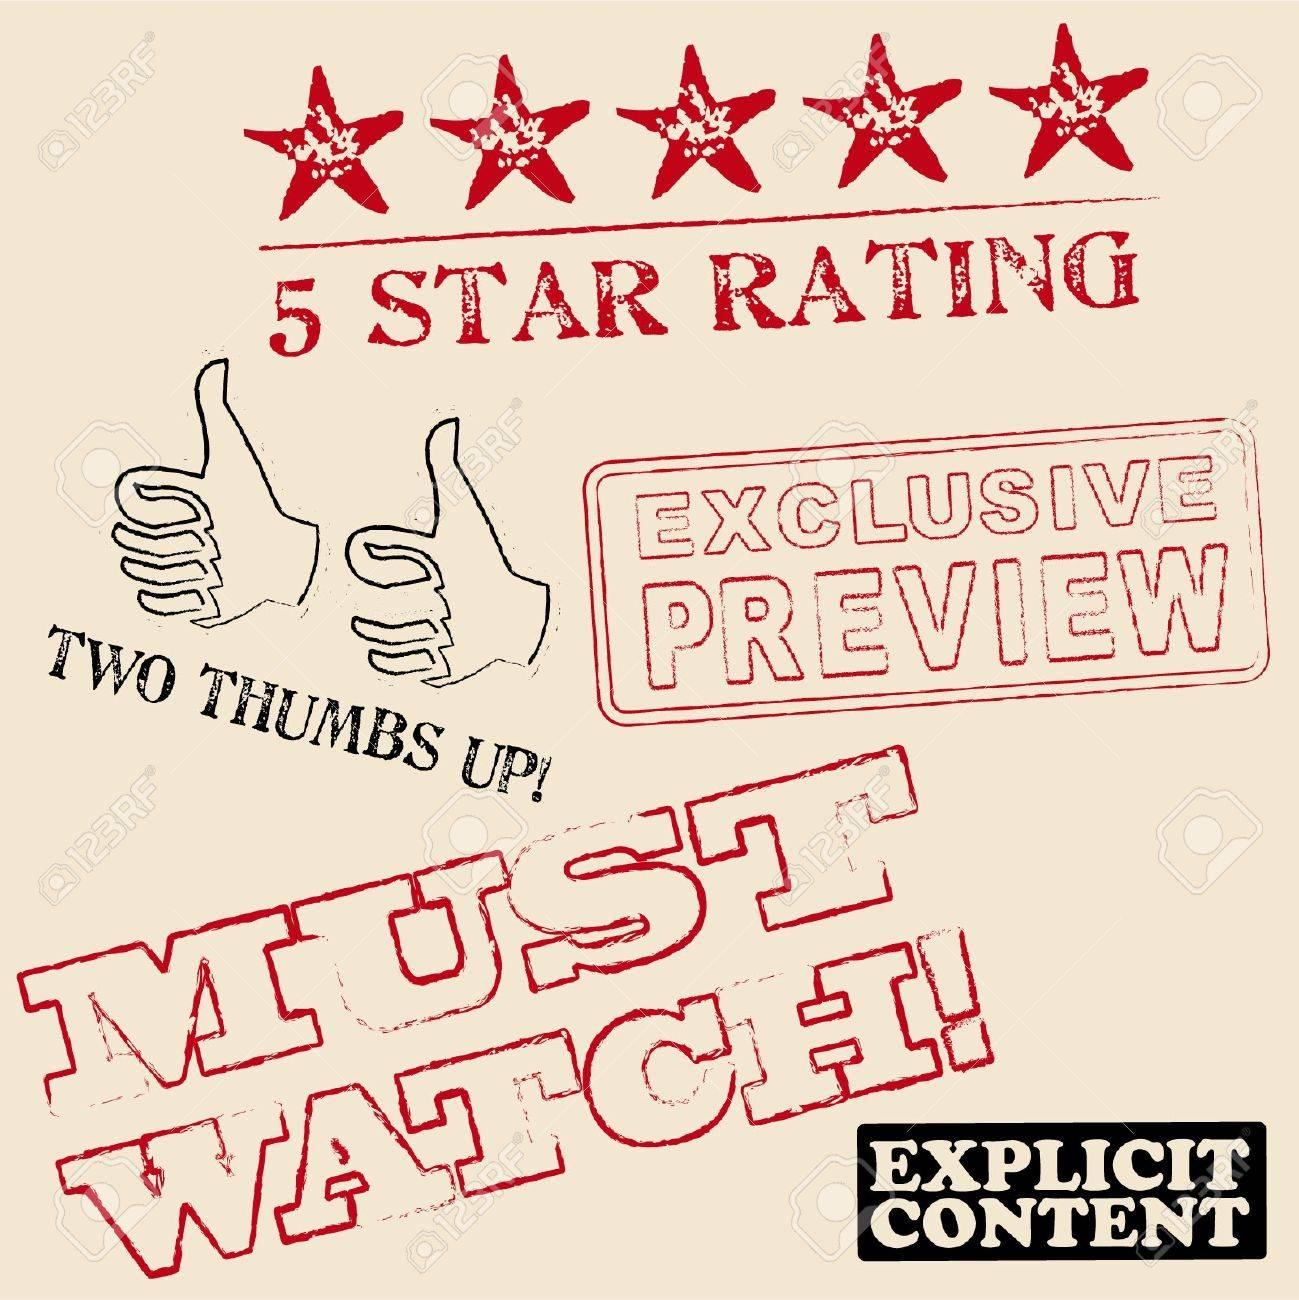 Movie reviewa